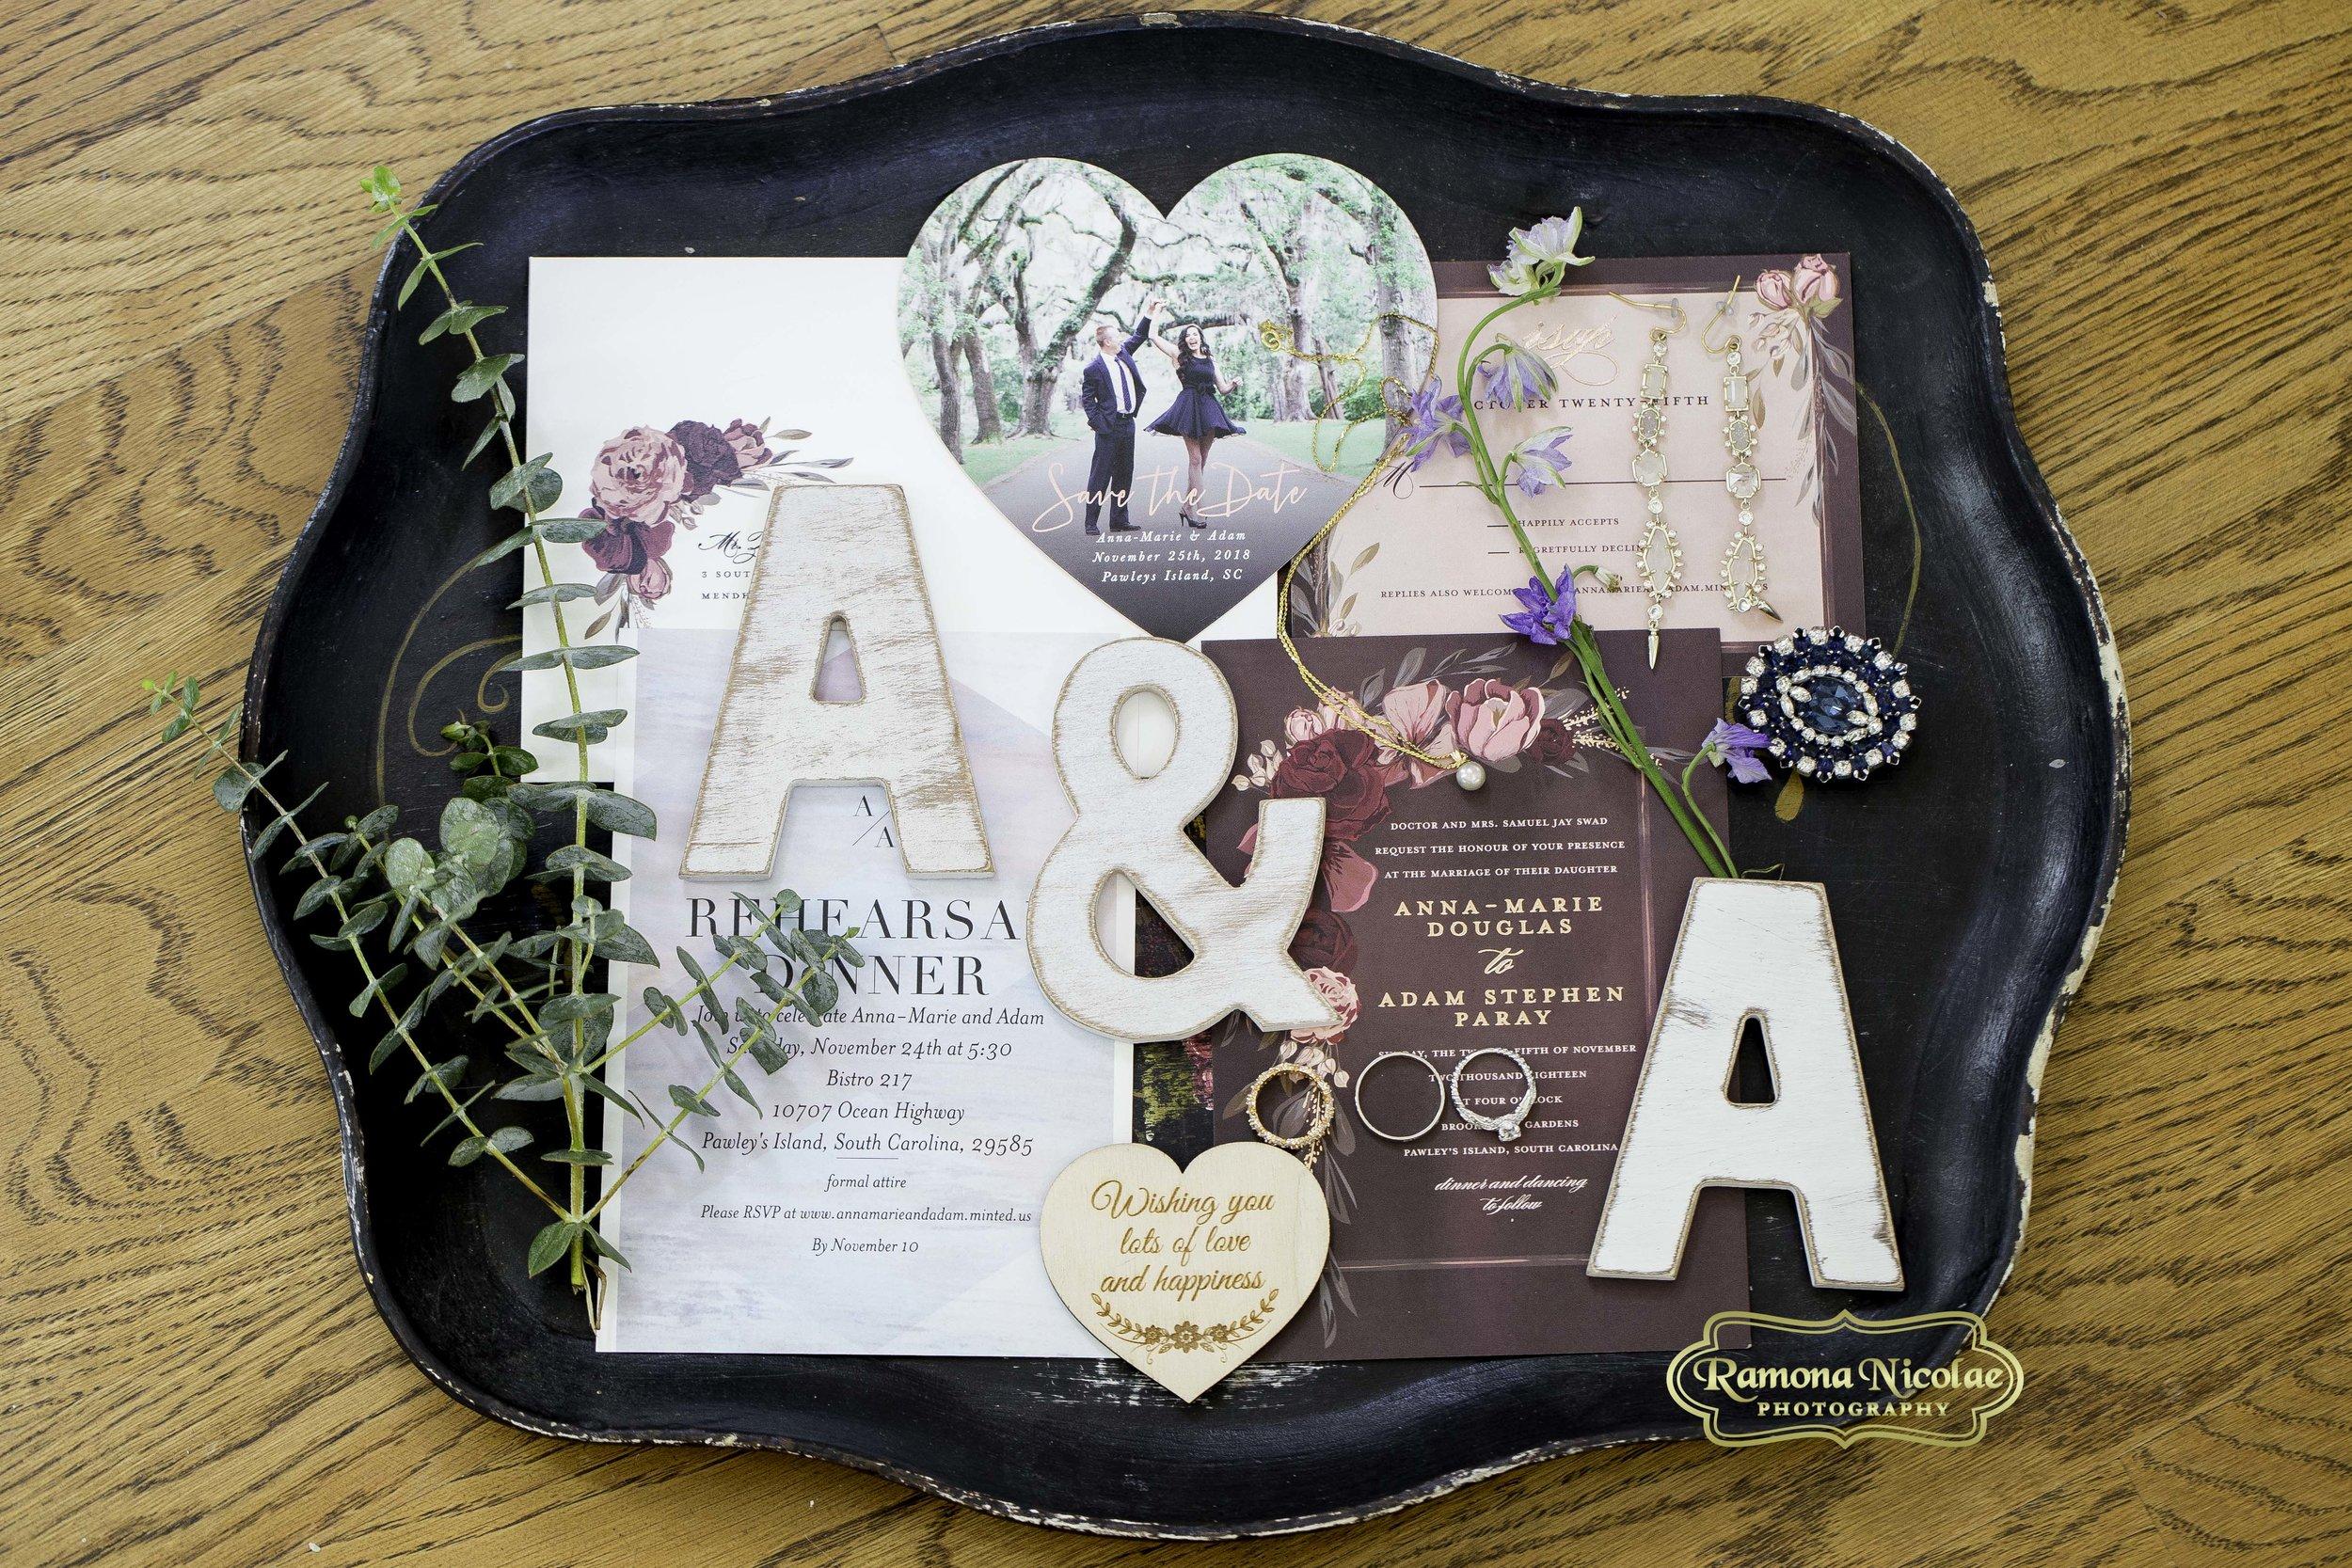 wedding details at brookgreen gardens with rings ramona nicolae photography .jpg